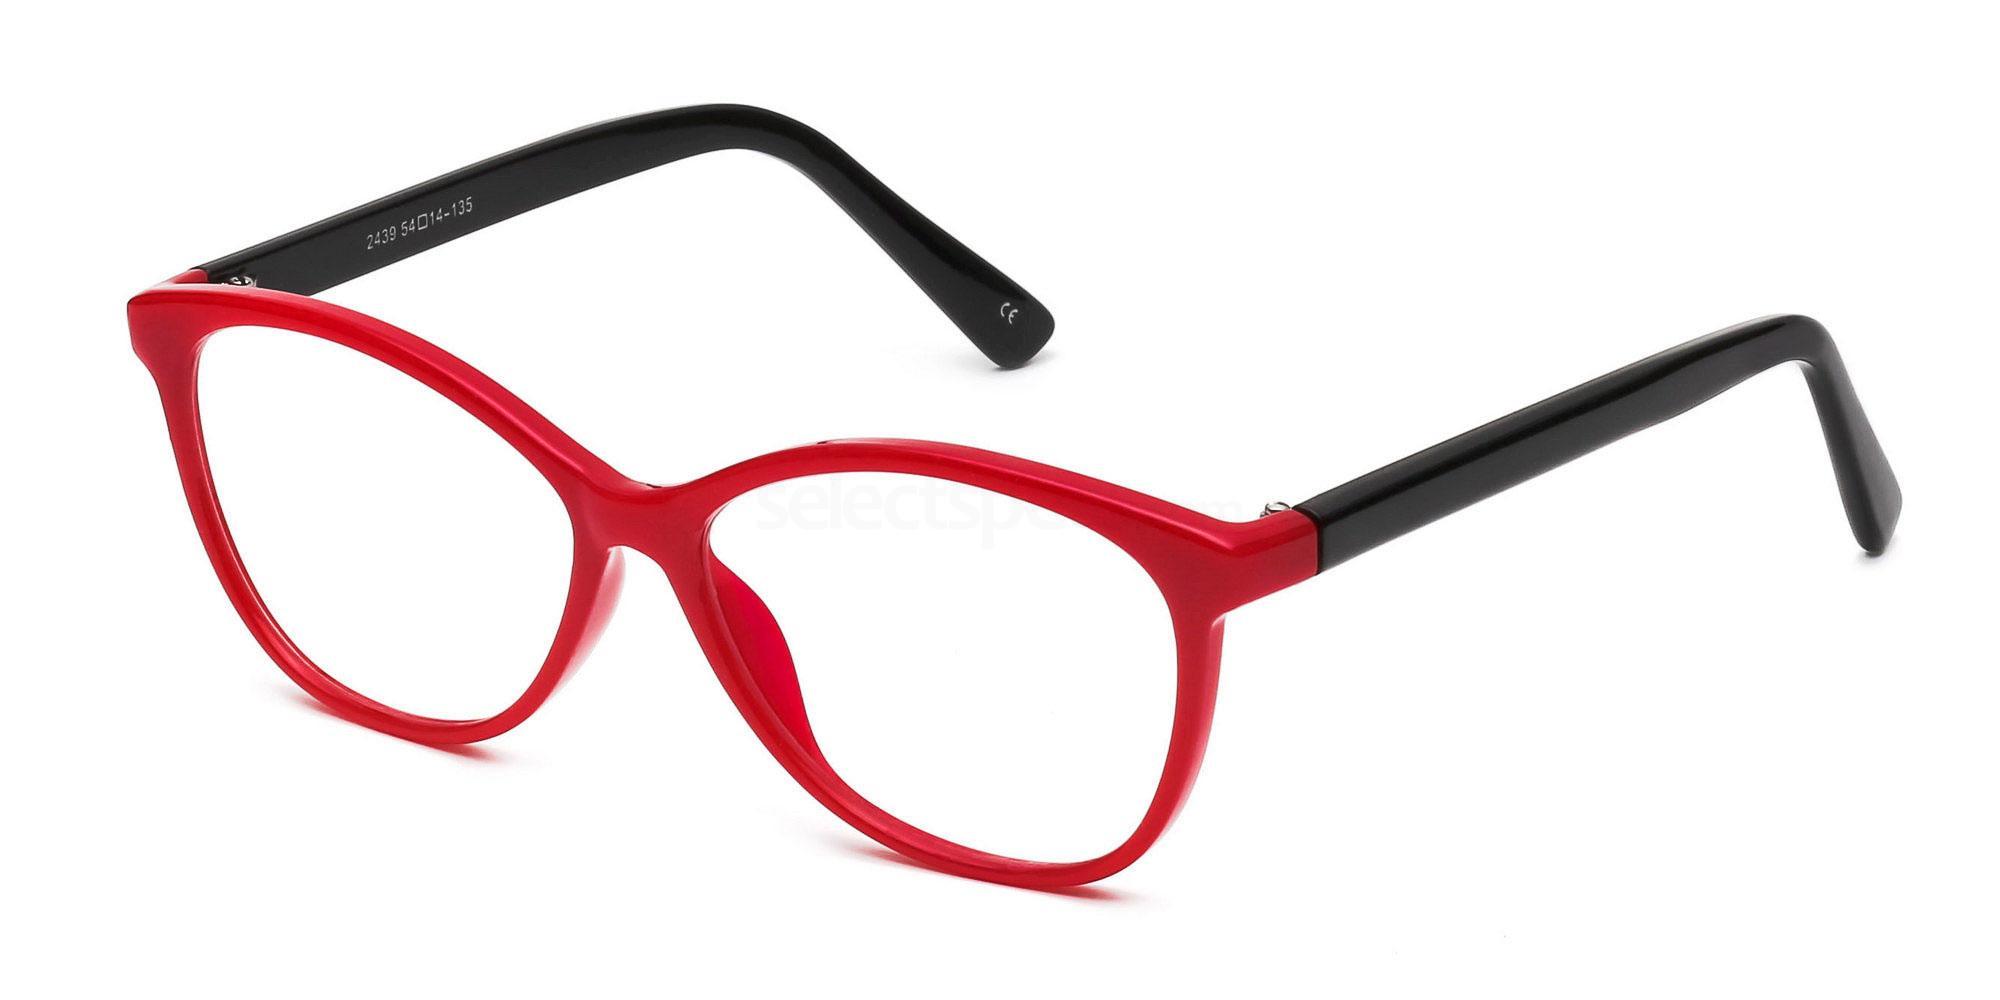 Savannah 2439 Red & Black Selectspecs.com